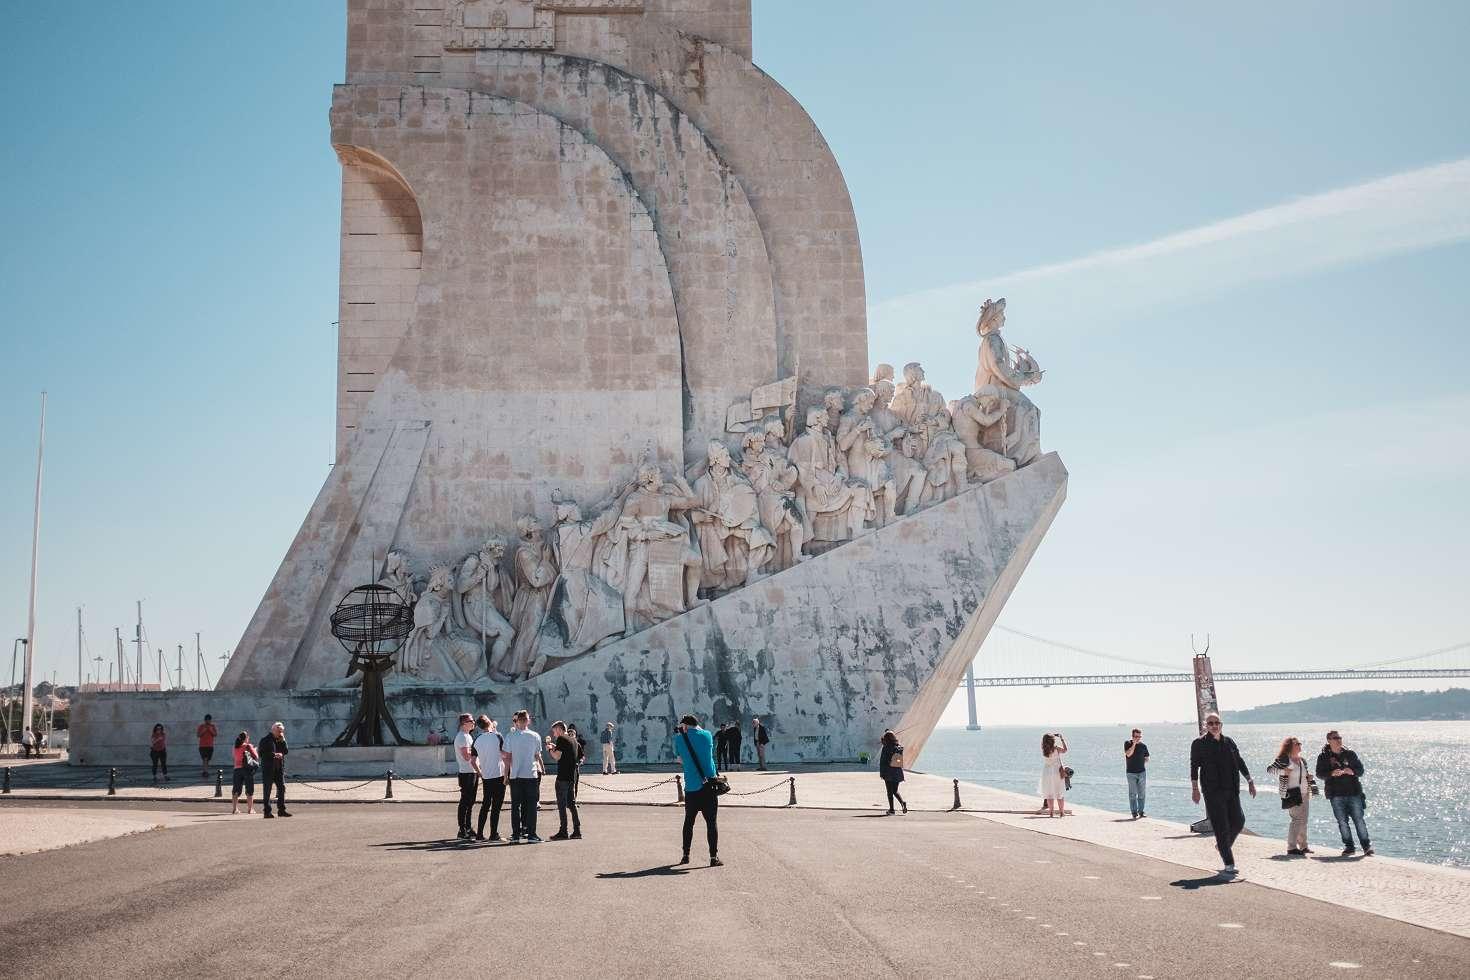 Valencia-Lissabon-Vigo-Stonehenge (19)